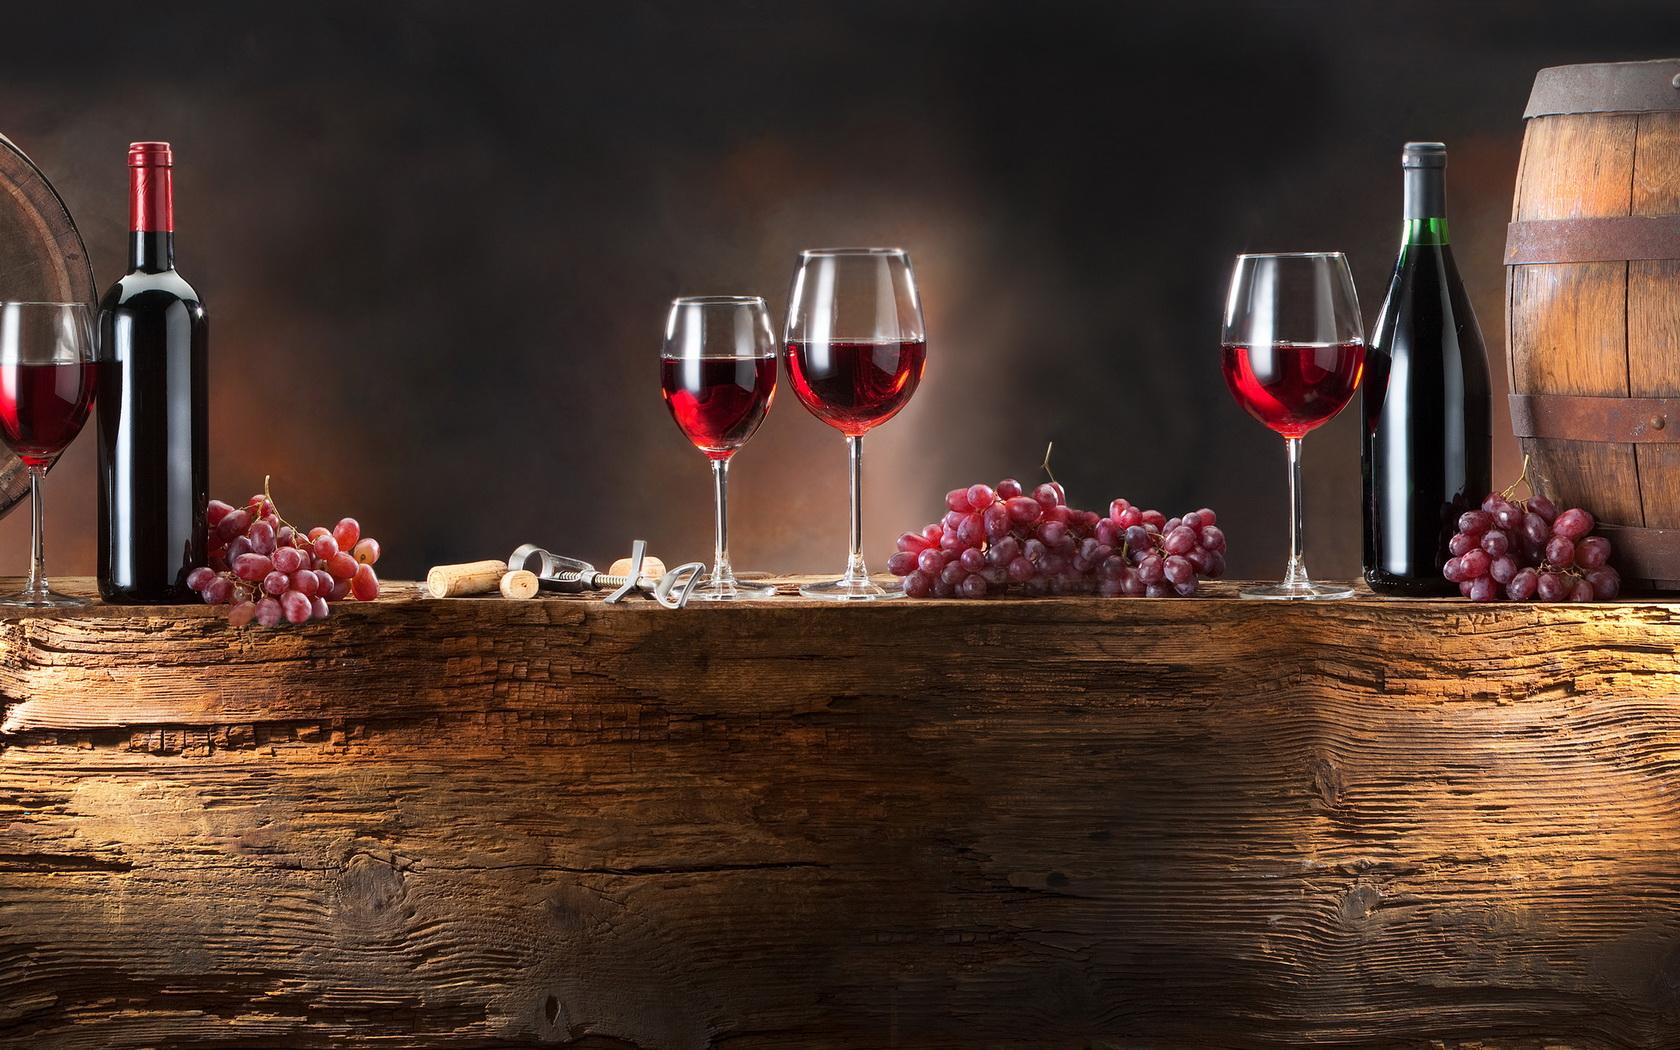 wine rose wallpaper 1680x1050 138717 wallpaperup